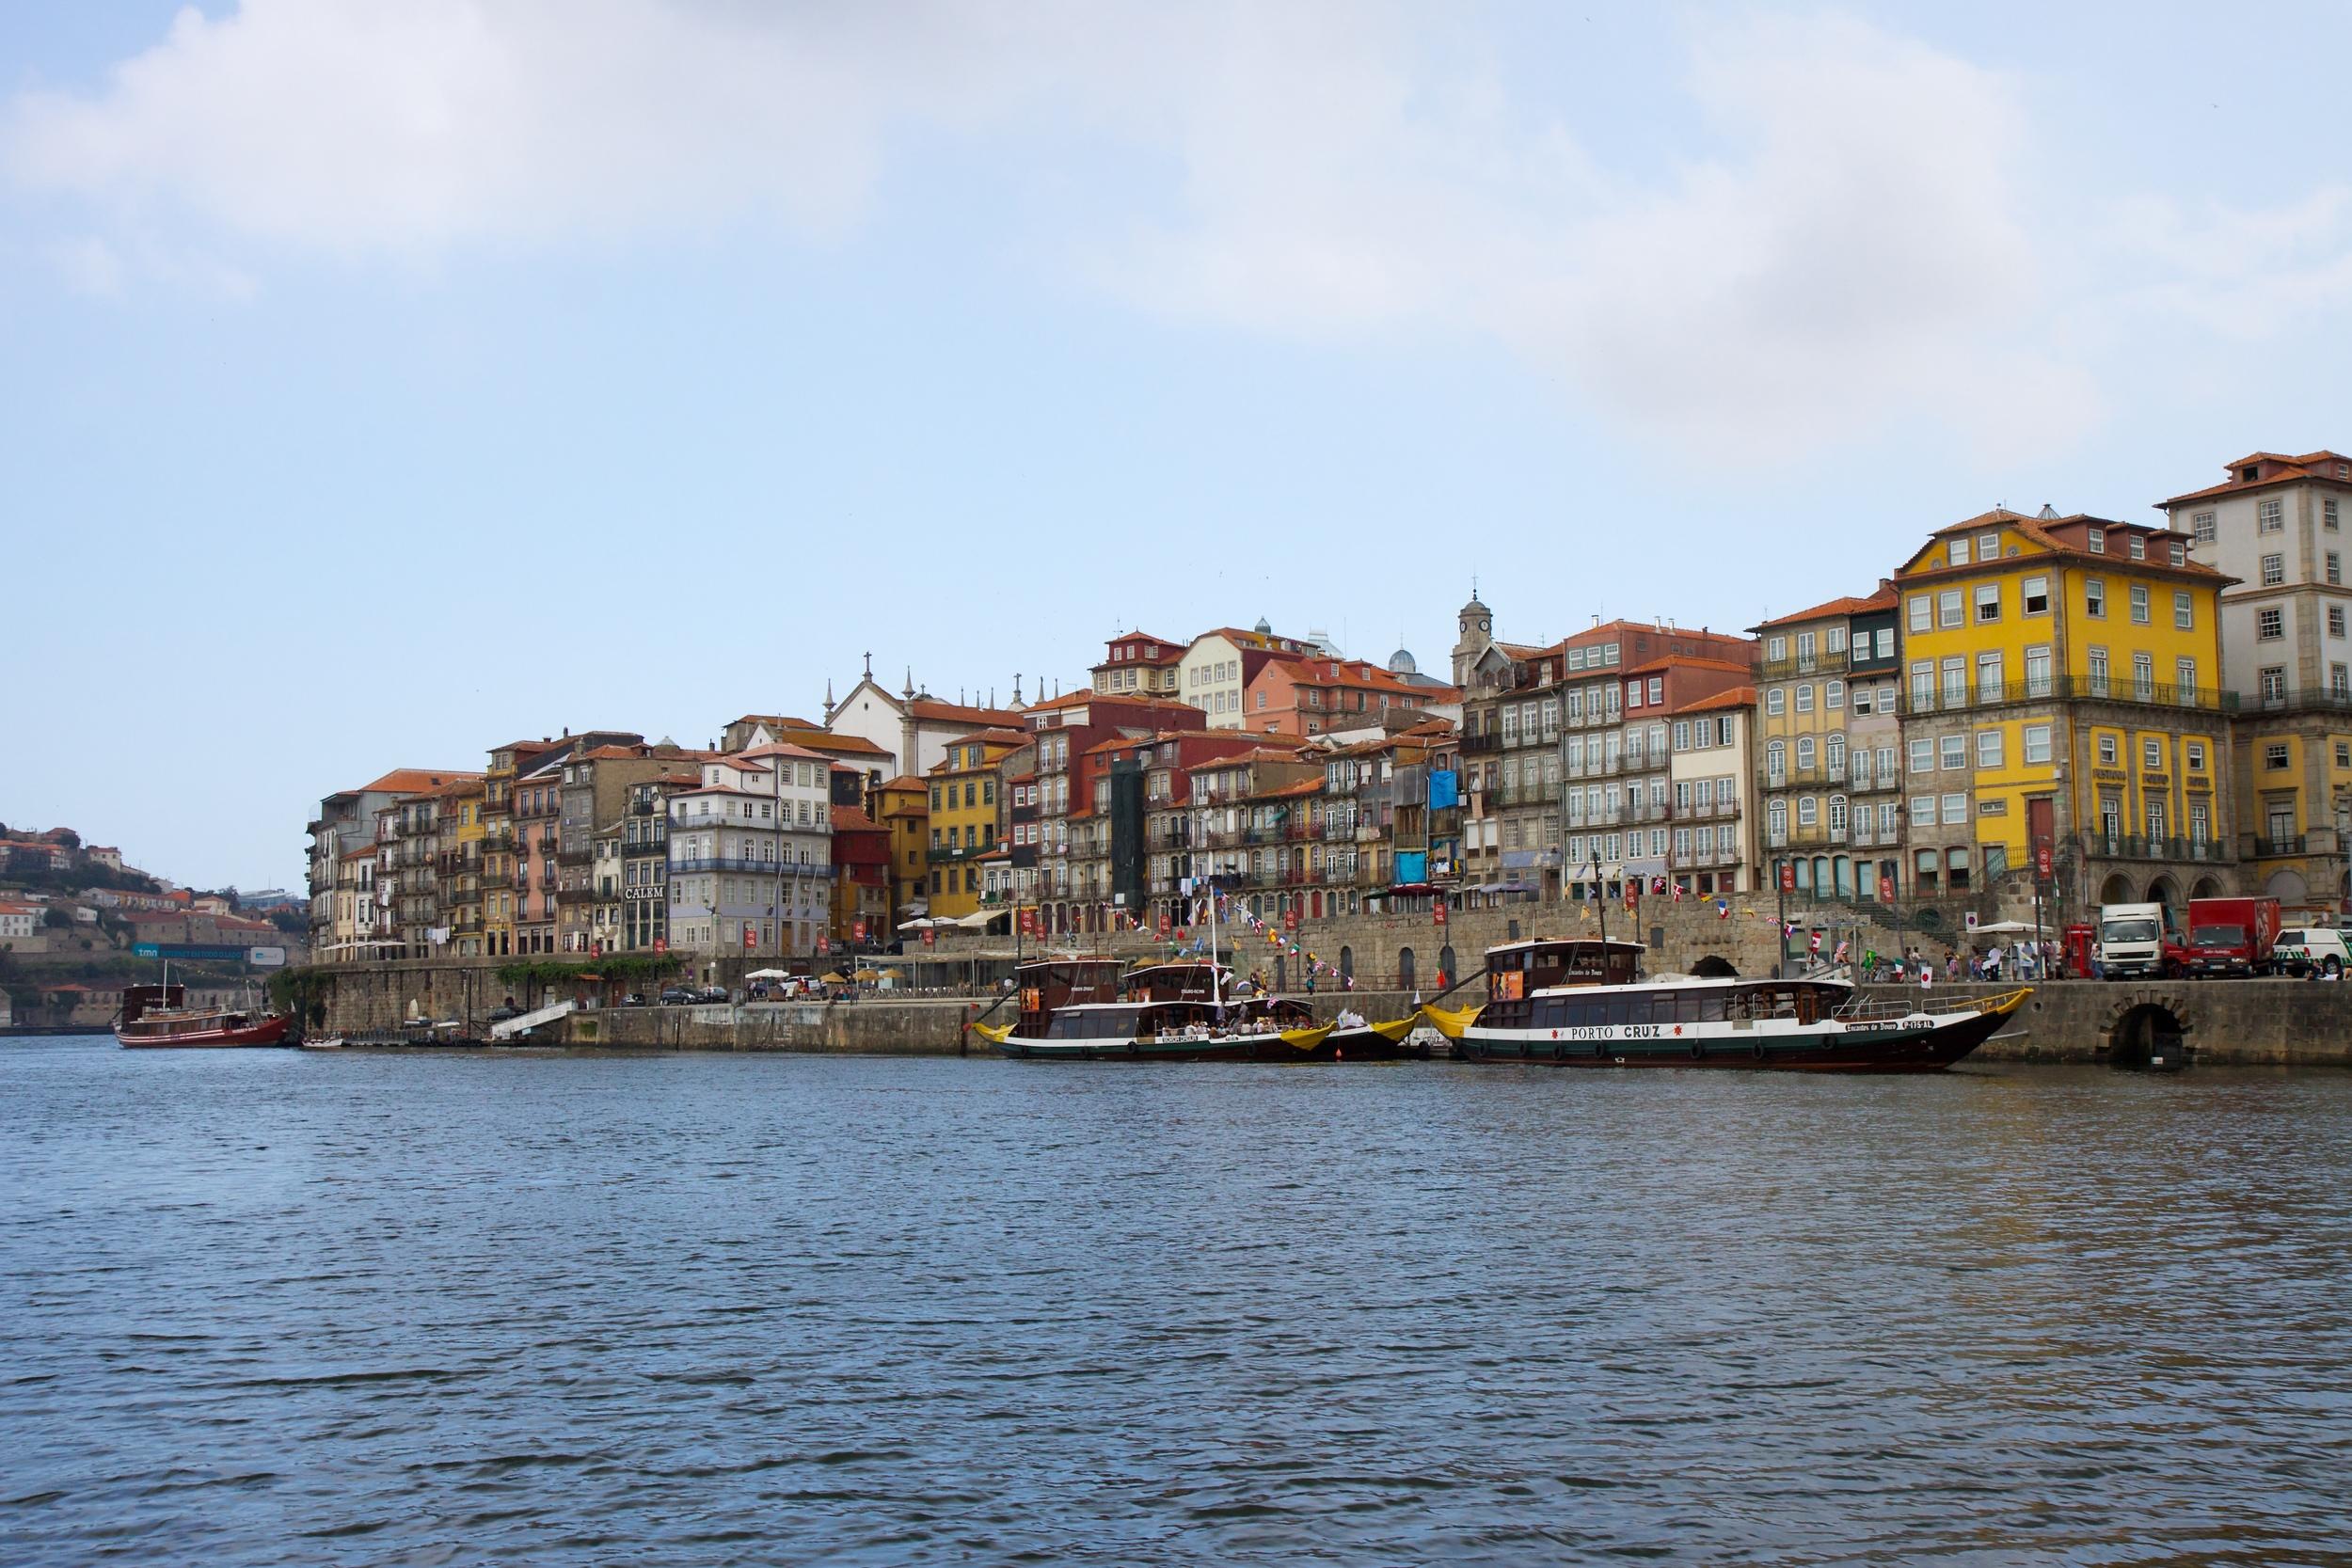 porto-juillet-2011-178.jpg